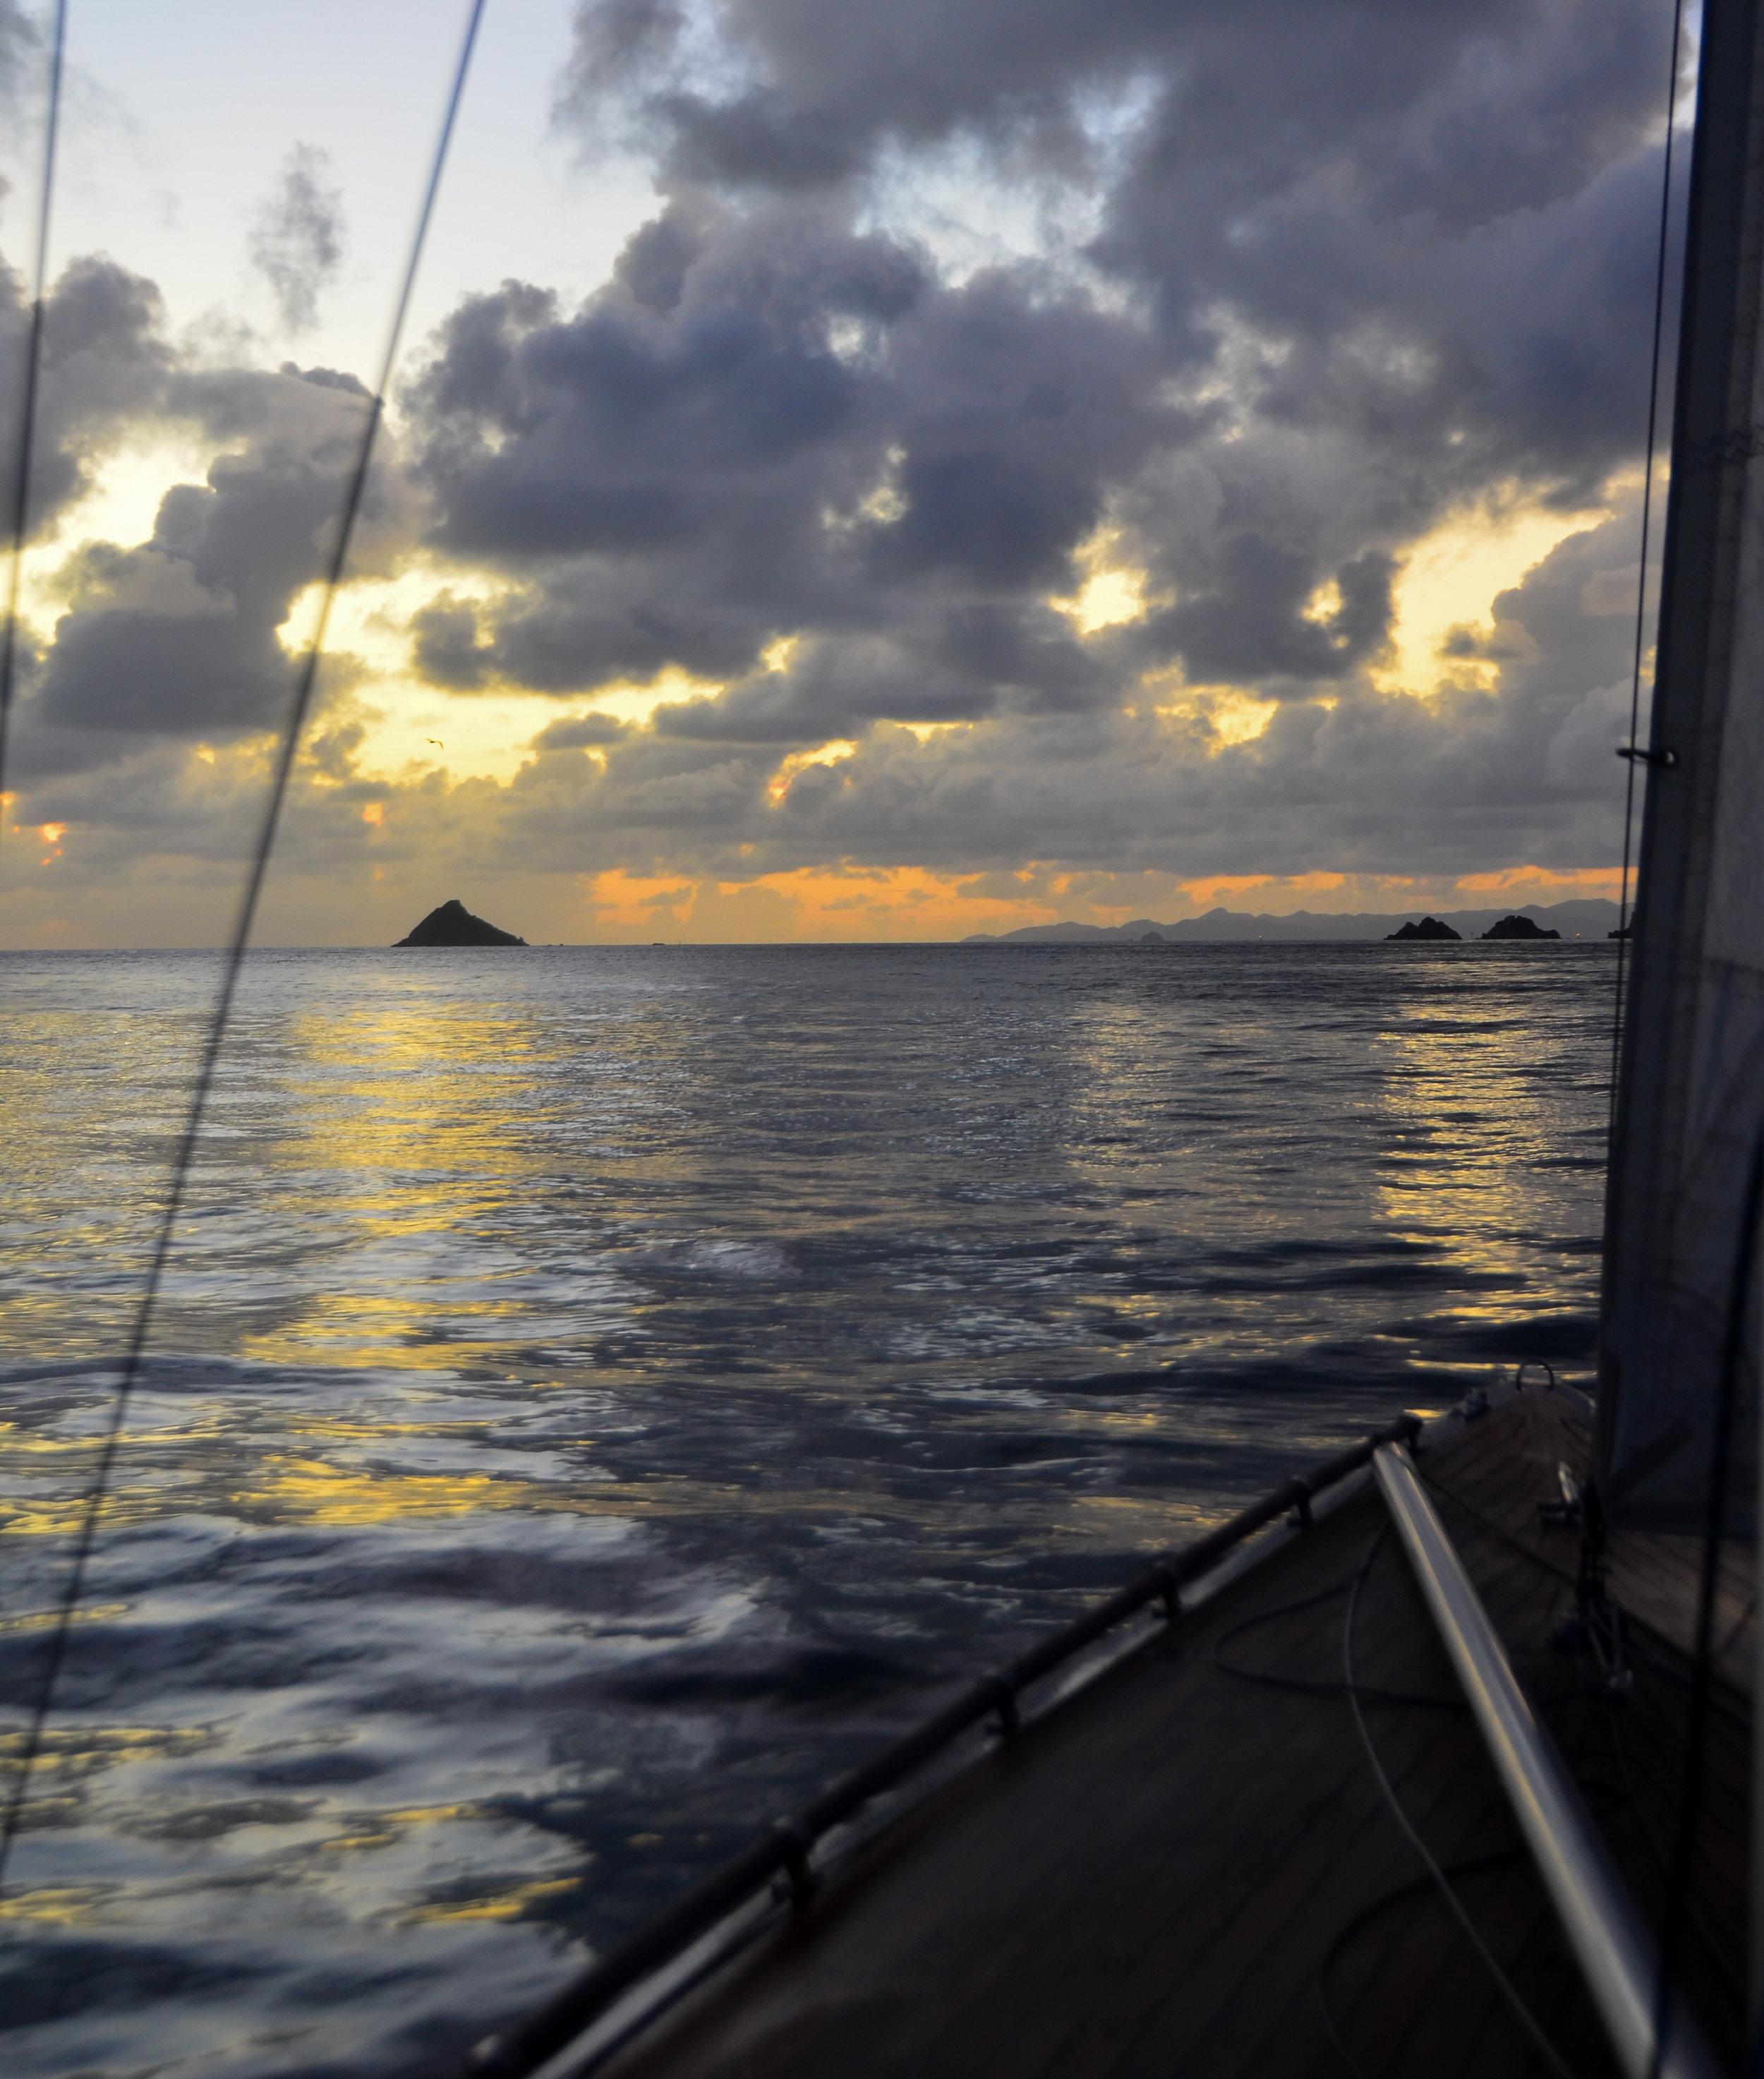 Sunset Sail - Gustavia | Aug 2010